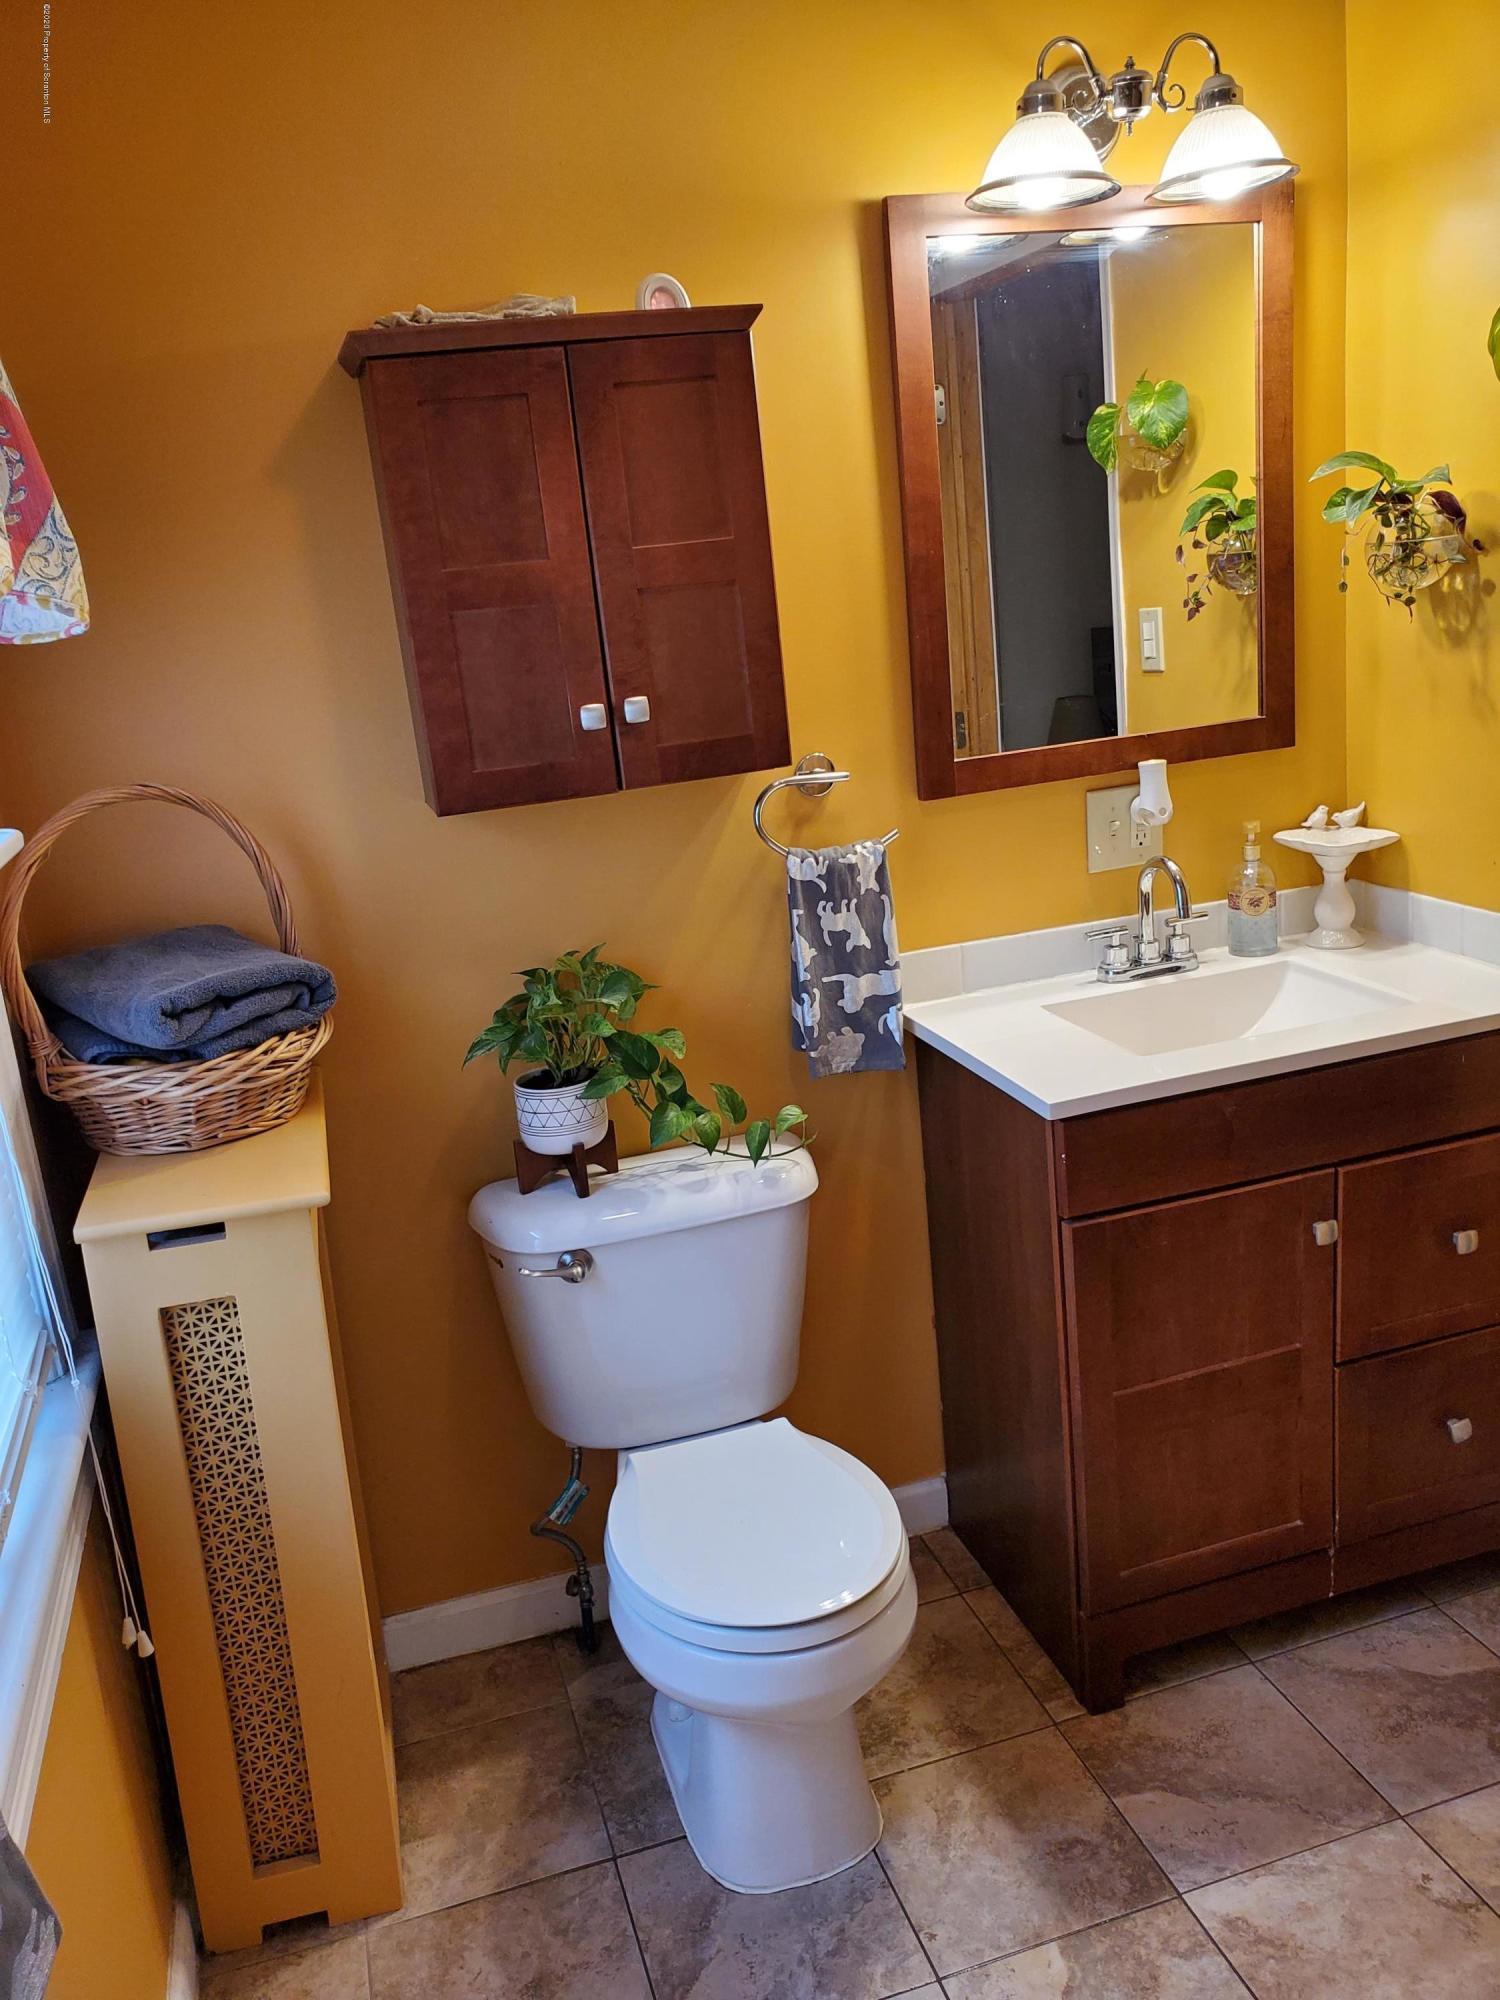 1235 Dundaff St, Dickson City, Pennsylvania 18519, 3 Bedrooms Bedrooms, 6 Rooms Rooms,1 BathroomBathrooms,Single Family,For Sale,Dundaff,20-1220